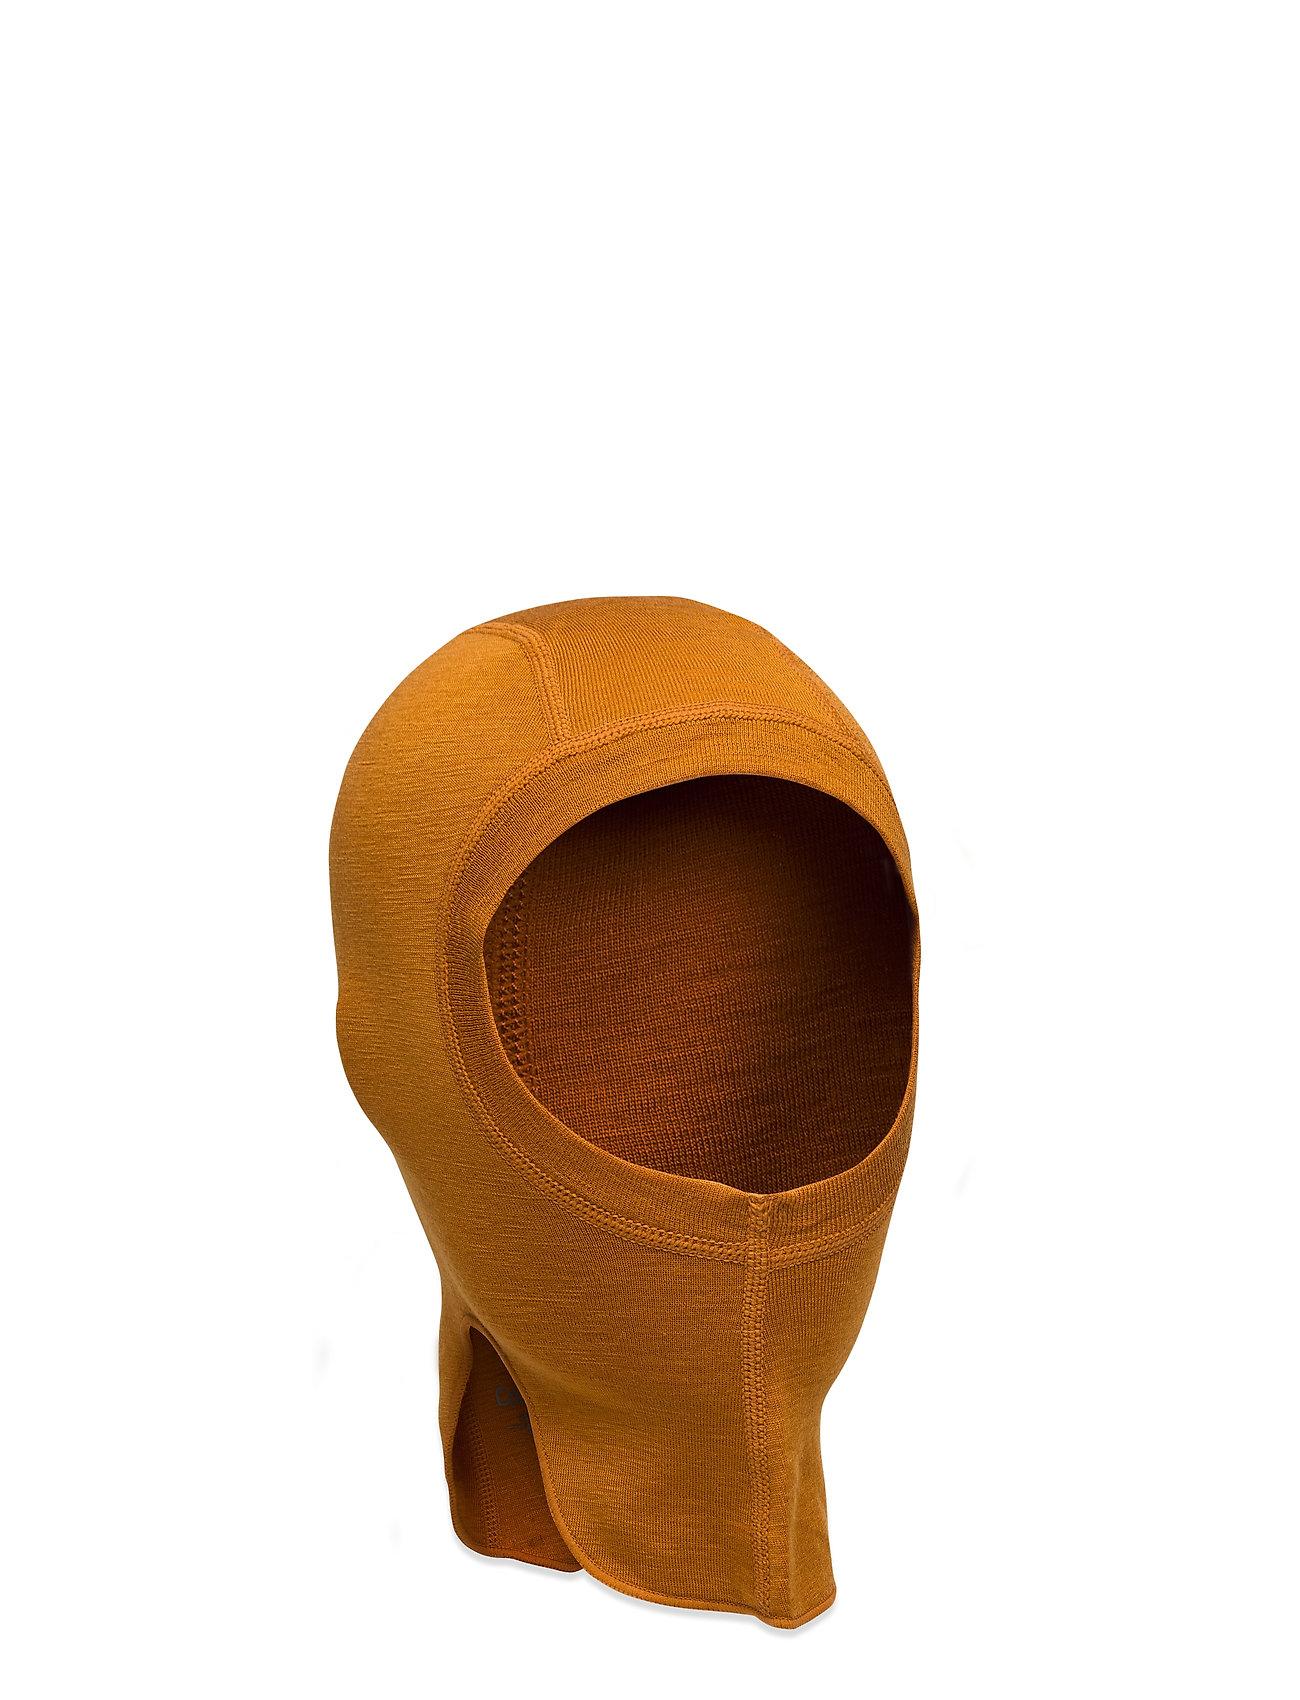 Image of Balaclava, Double Layer Accessories Headwear Balaclava Orange CeLaVi (3445586553)